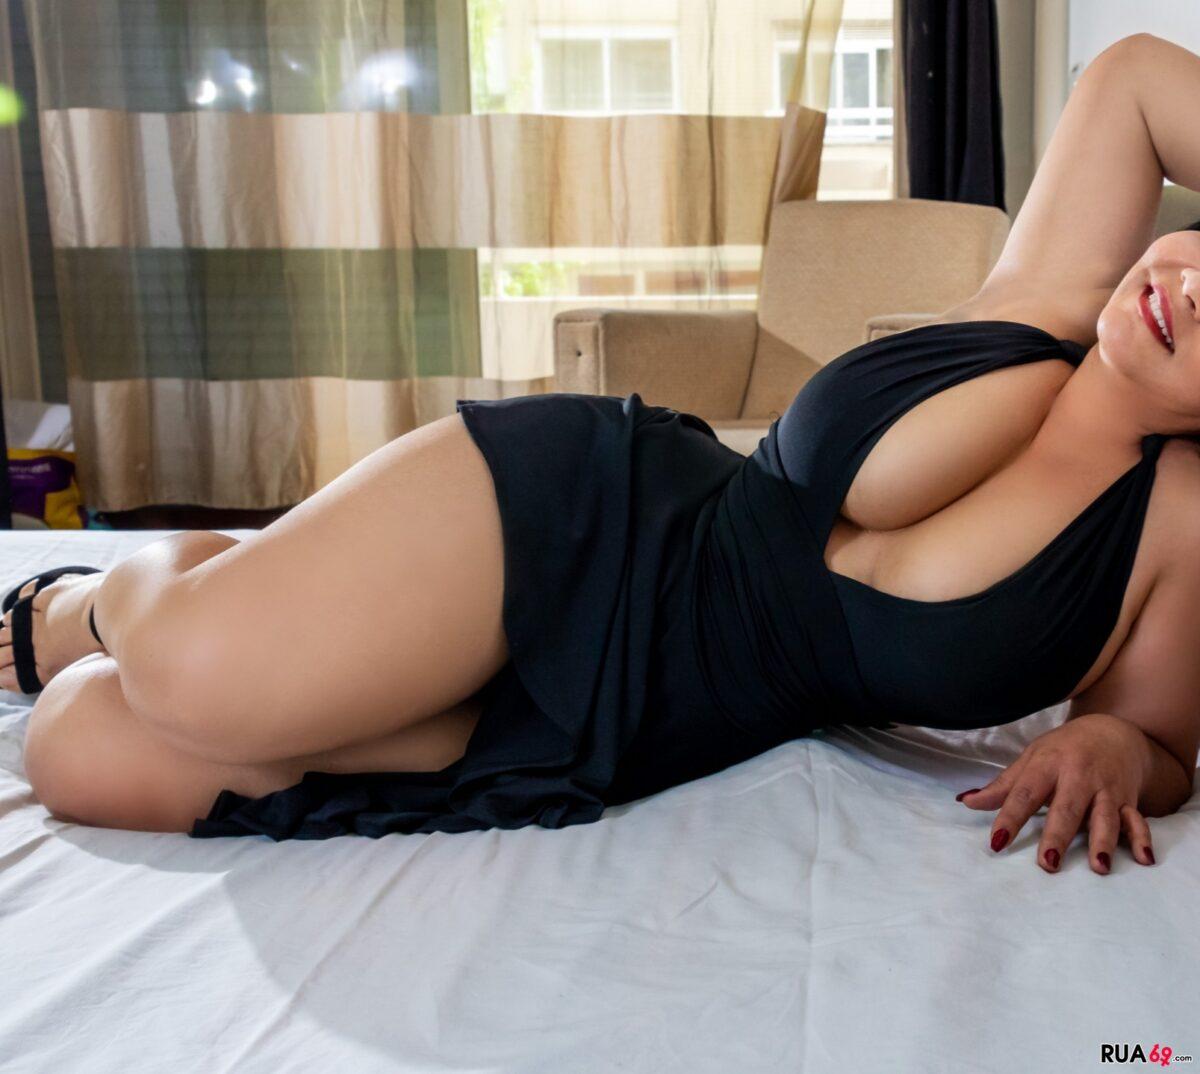 69 Sexo aysha massagista / show sexo virtual (maia)